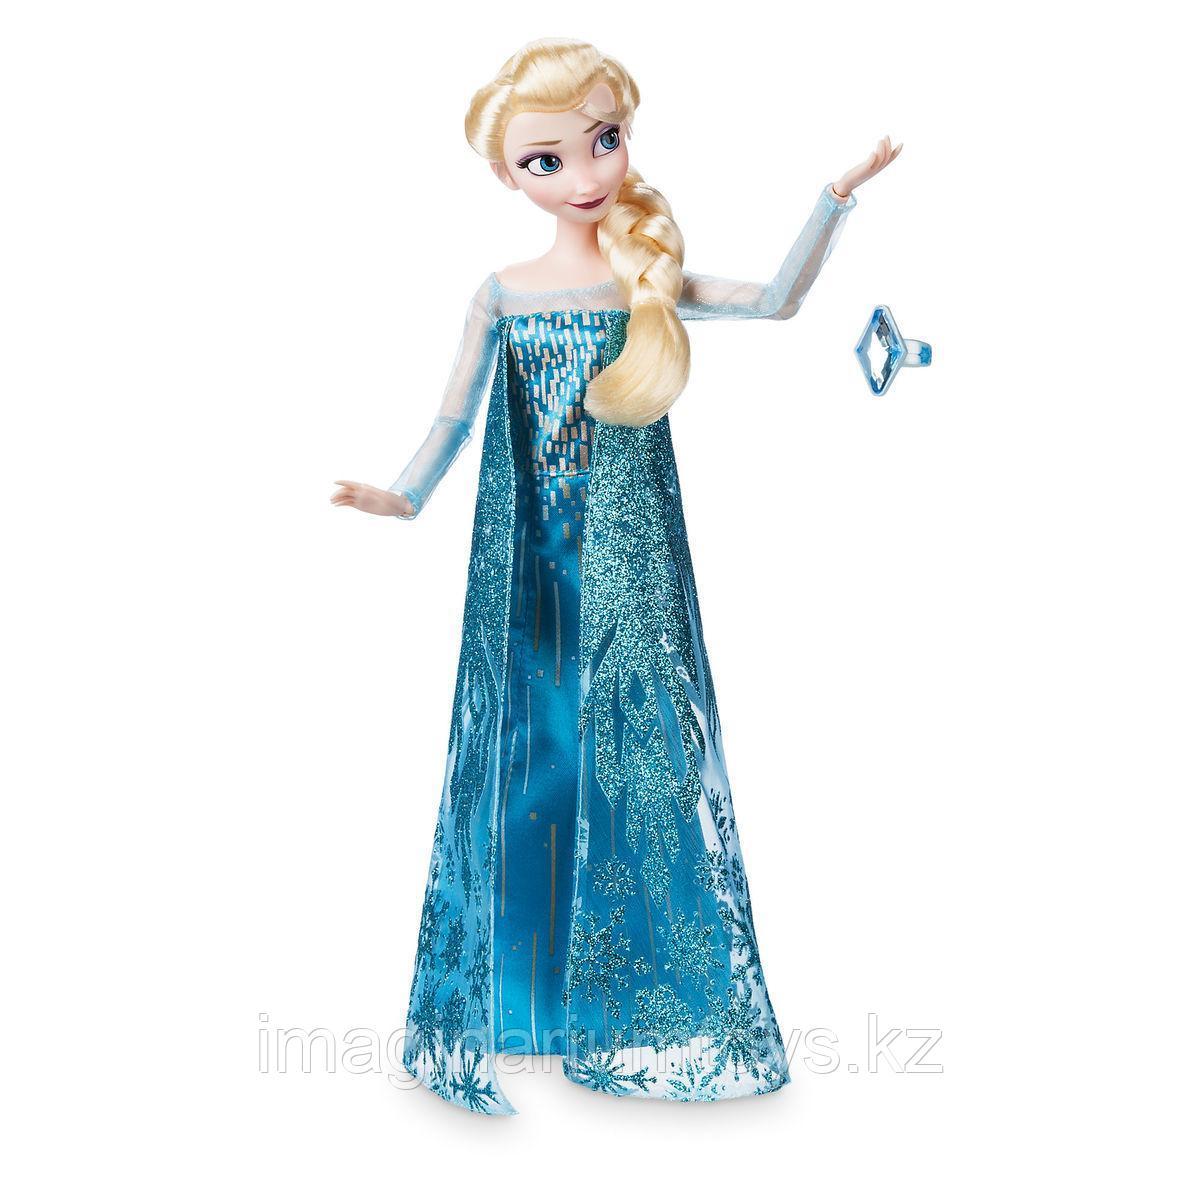 Кукла Эльза Disney - фото 2